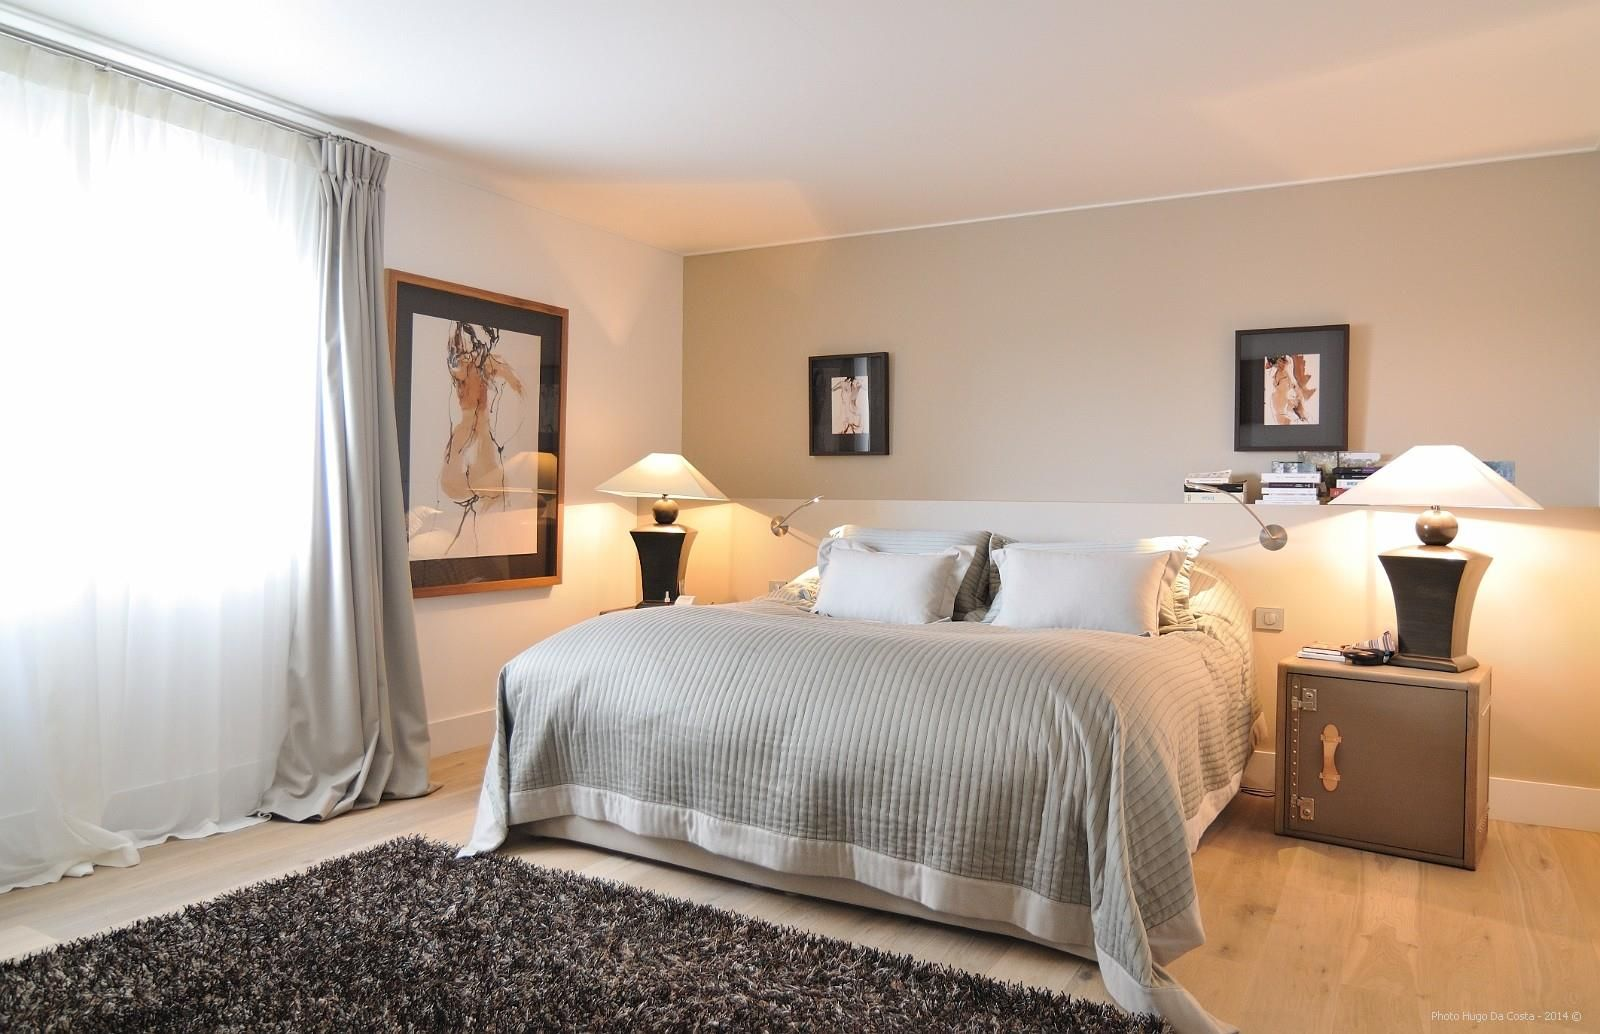 Chambre style lodge Africain standing | deco maison en 2019 ...